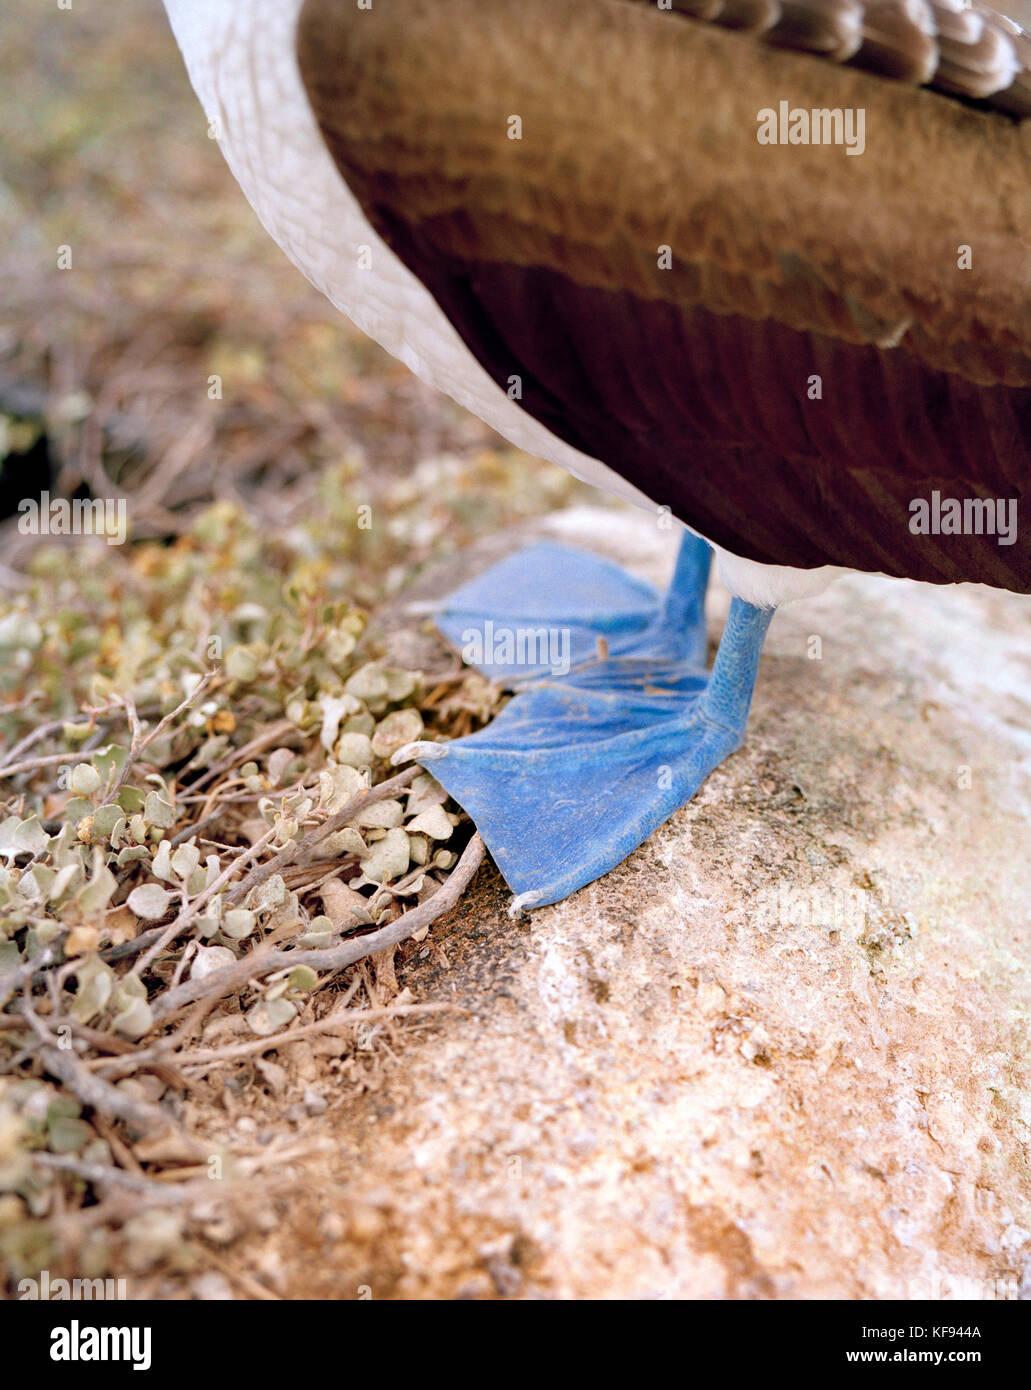 ECUADOR, Galapagos Islands, closeup of blue footed booby, Espanola Island - Stock Image